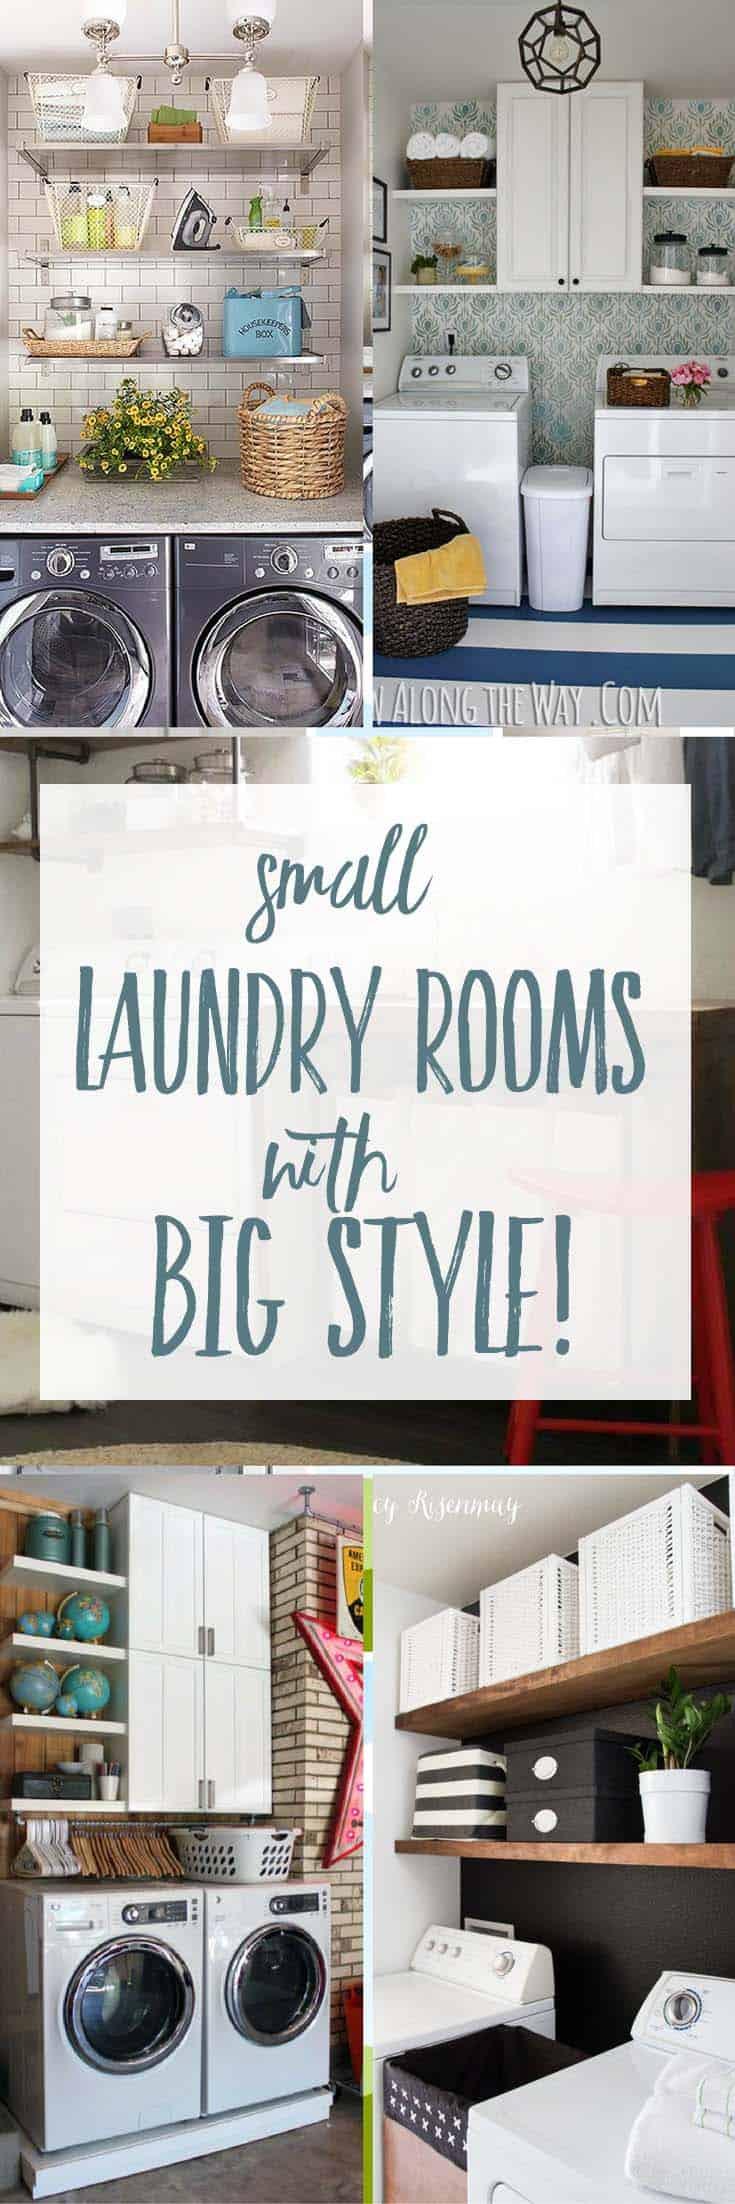 pinterest laundry room inspirations